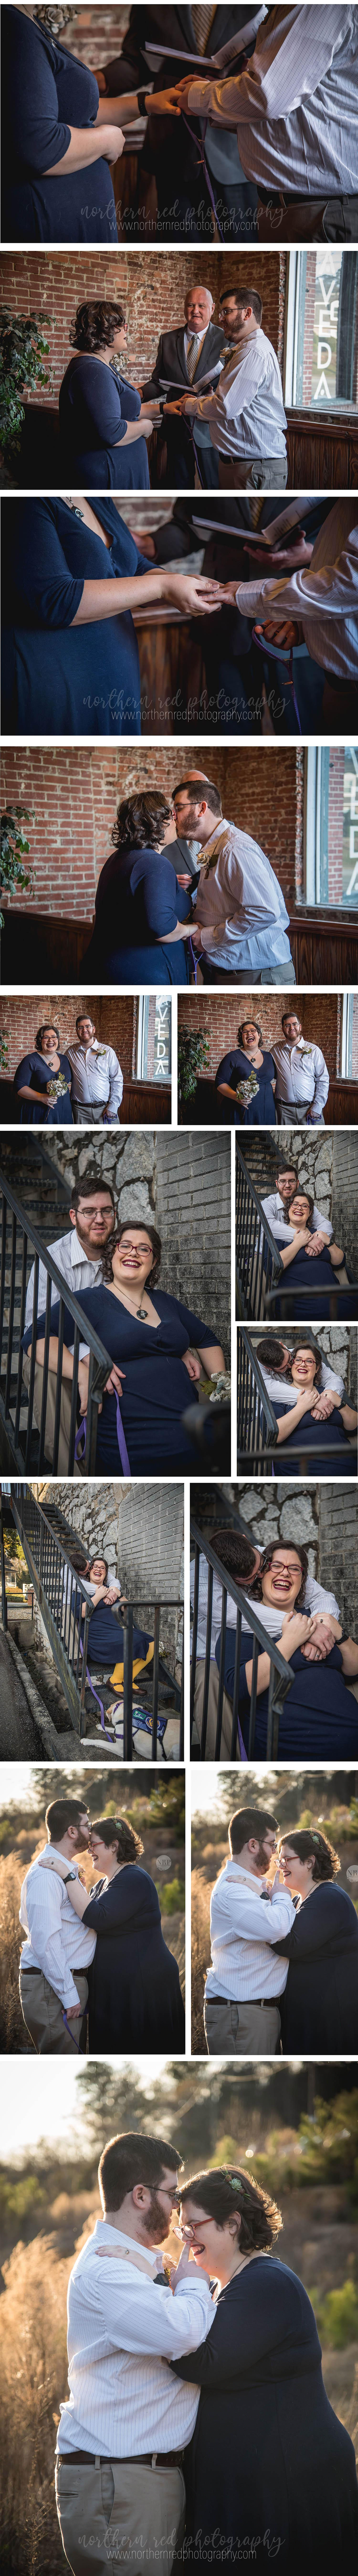 Northern Red Photography | Lexington, South Carolina Wedding Photographer